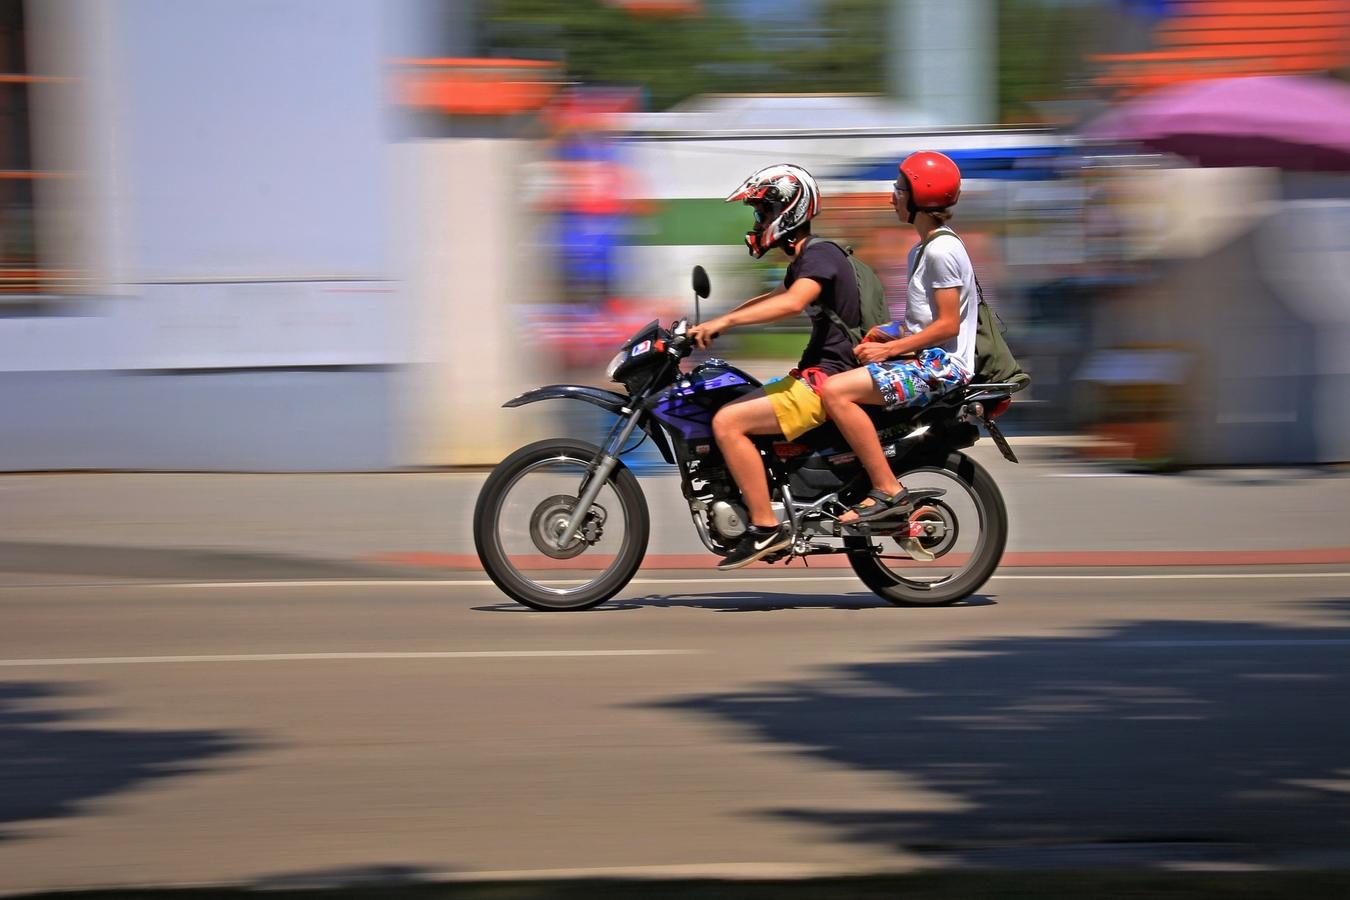 Dva na motorce